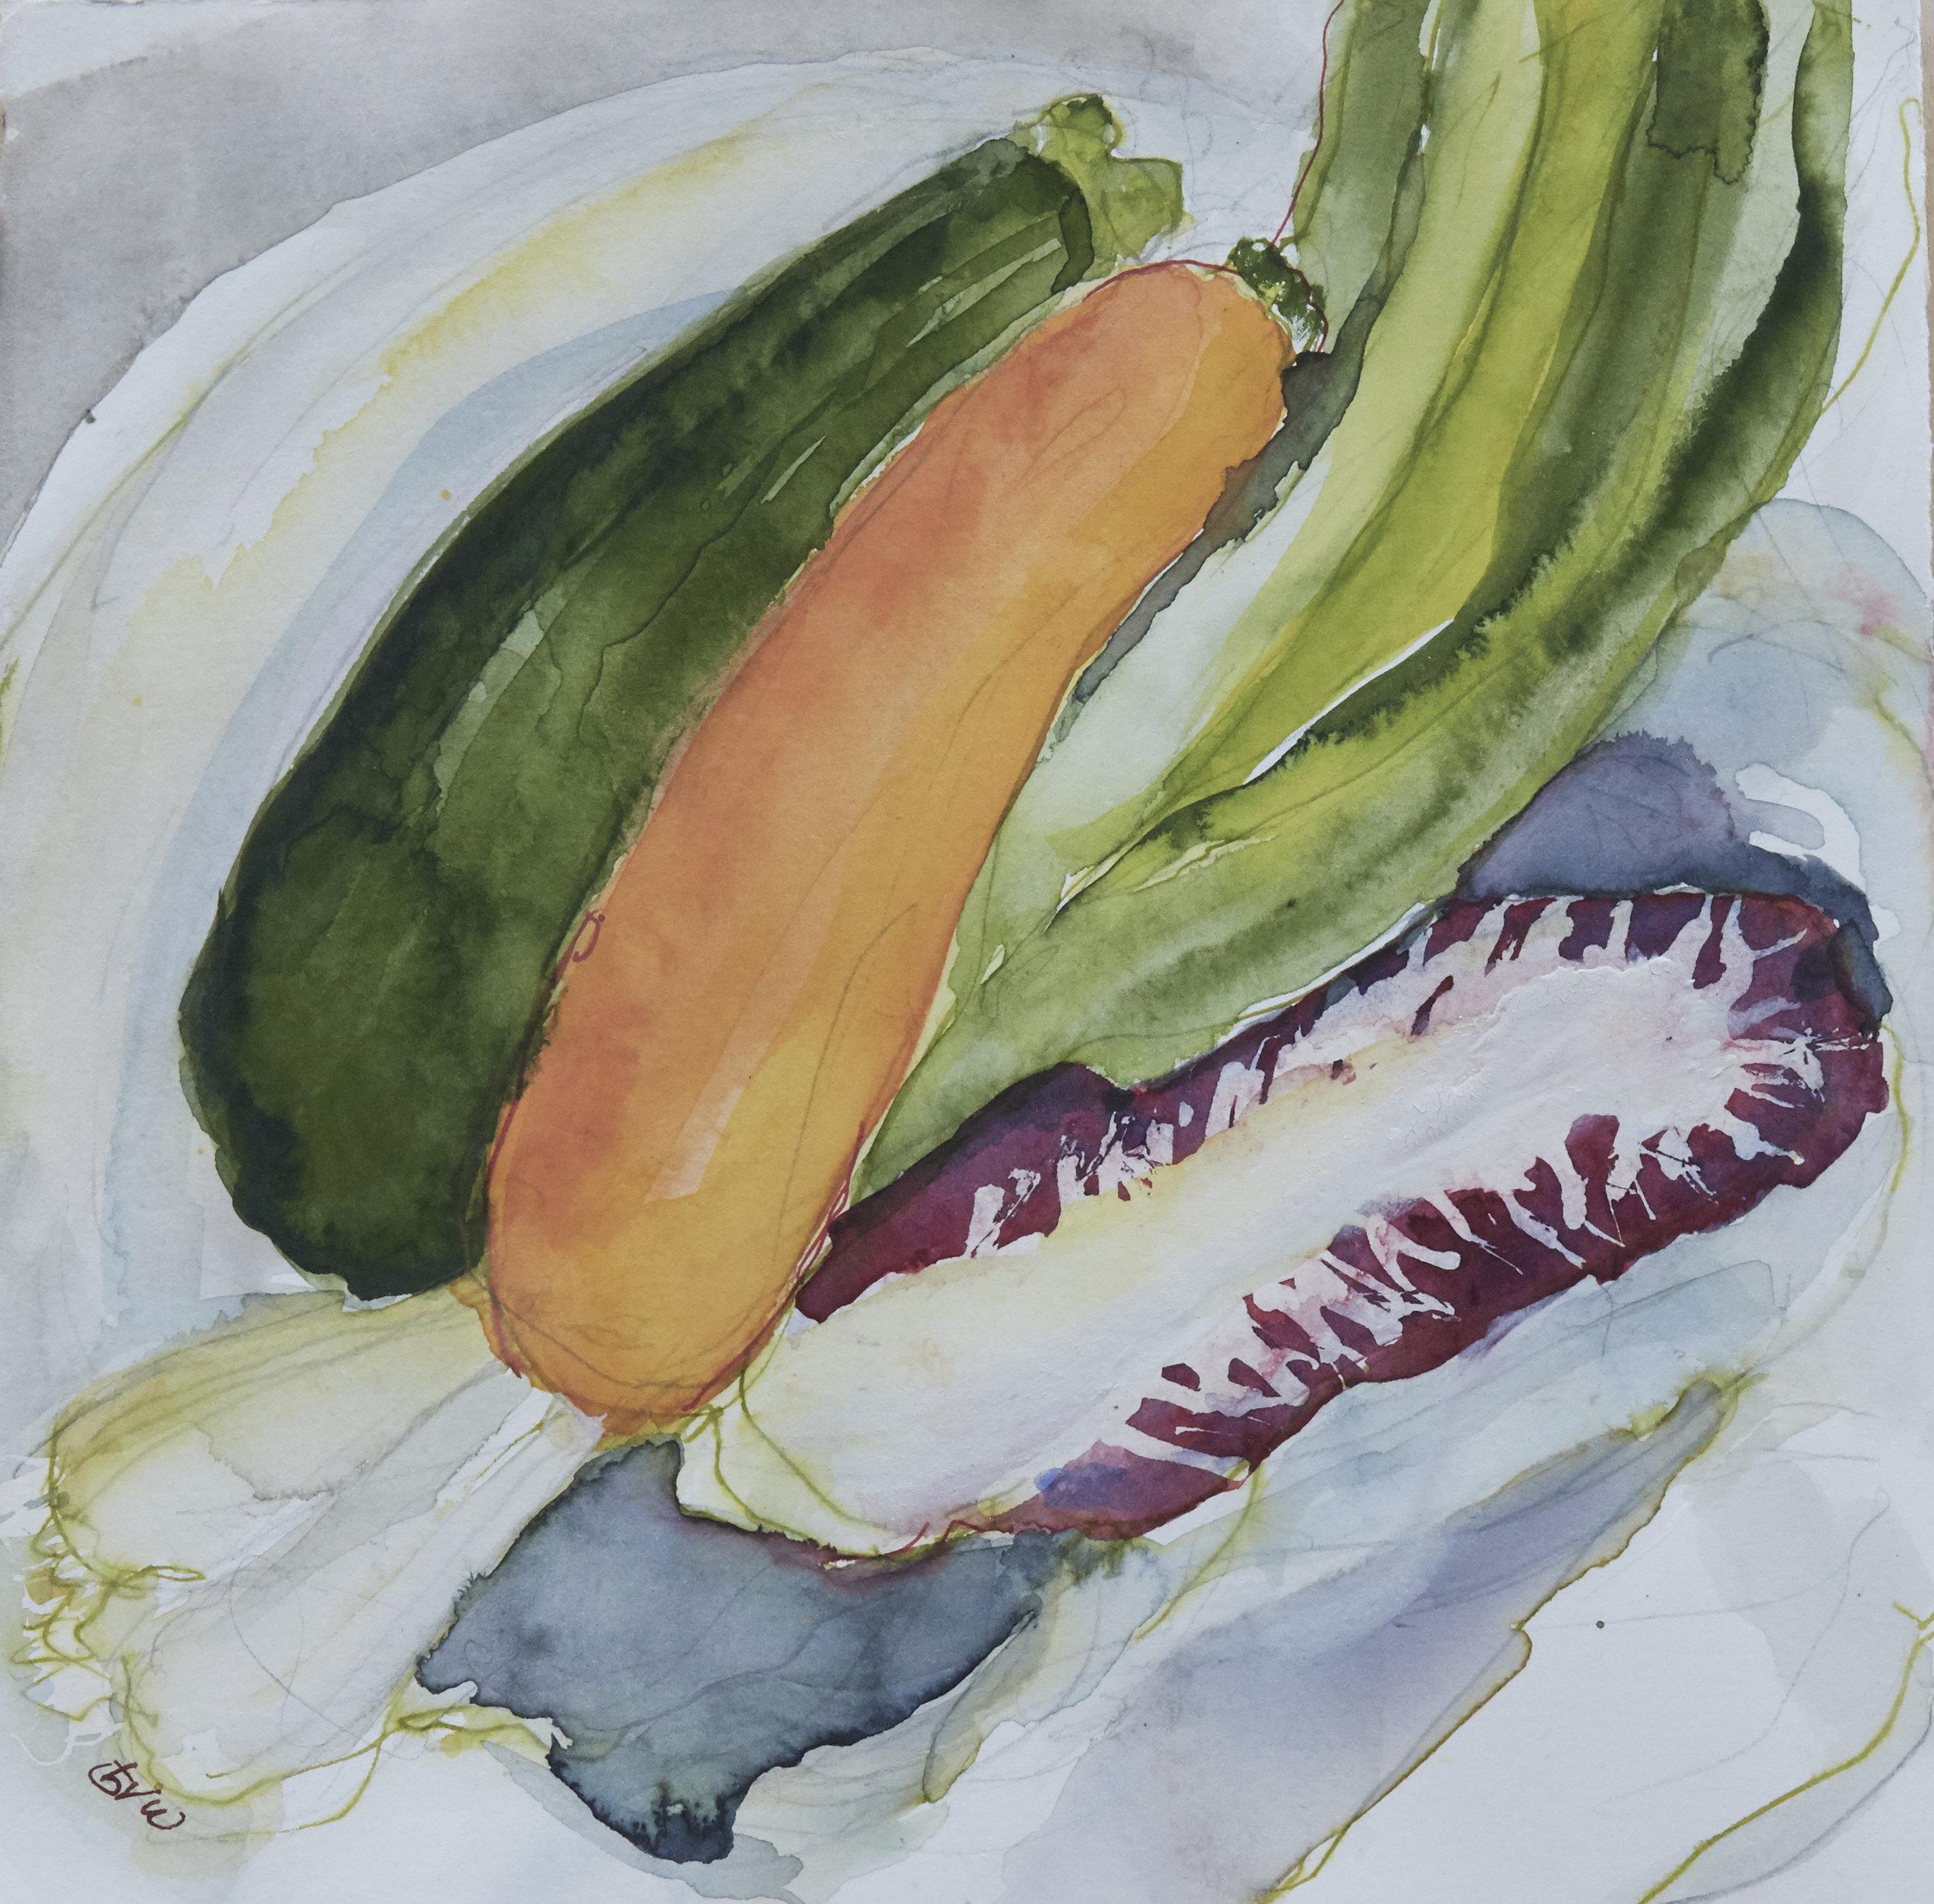 zucchini& radicchio   975